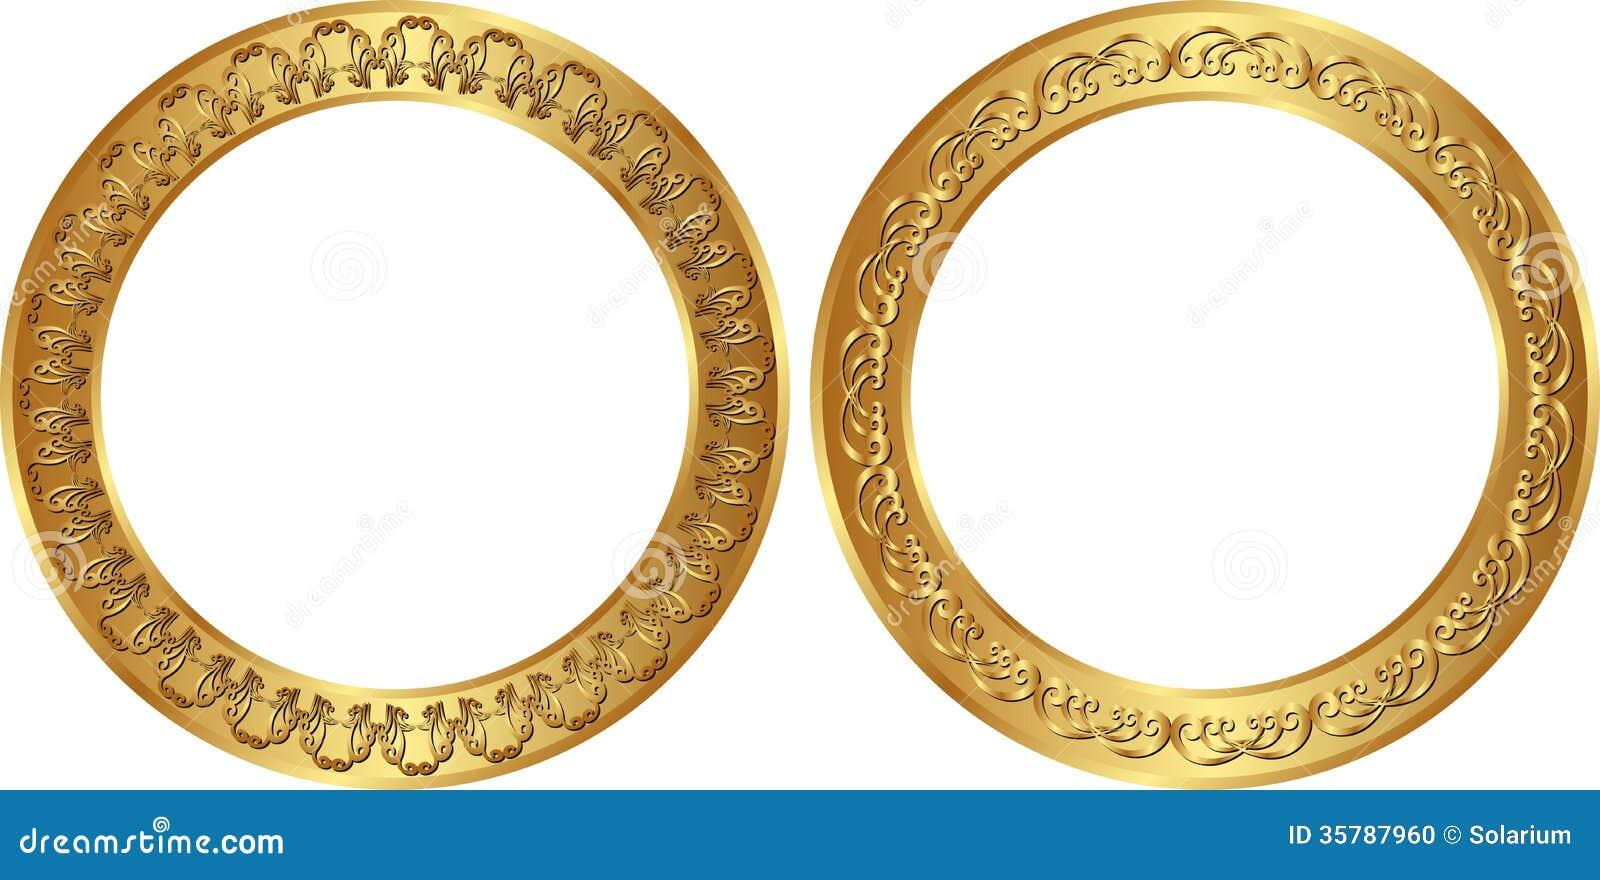 Goldene Rahmen vektor abbildung. Illustration von gold - 35787960